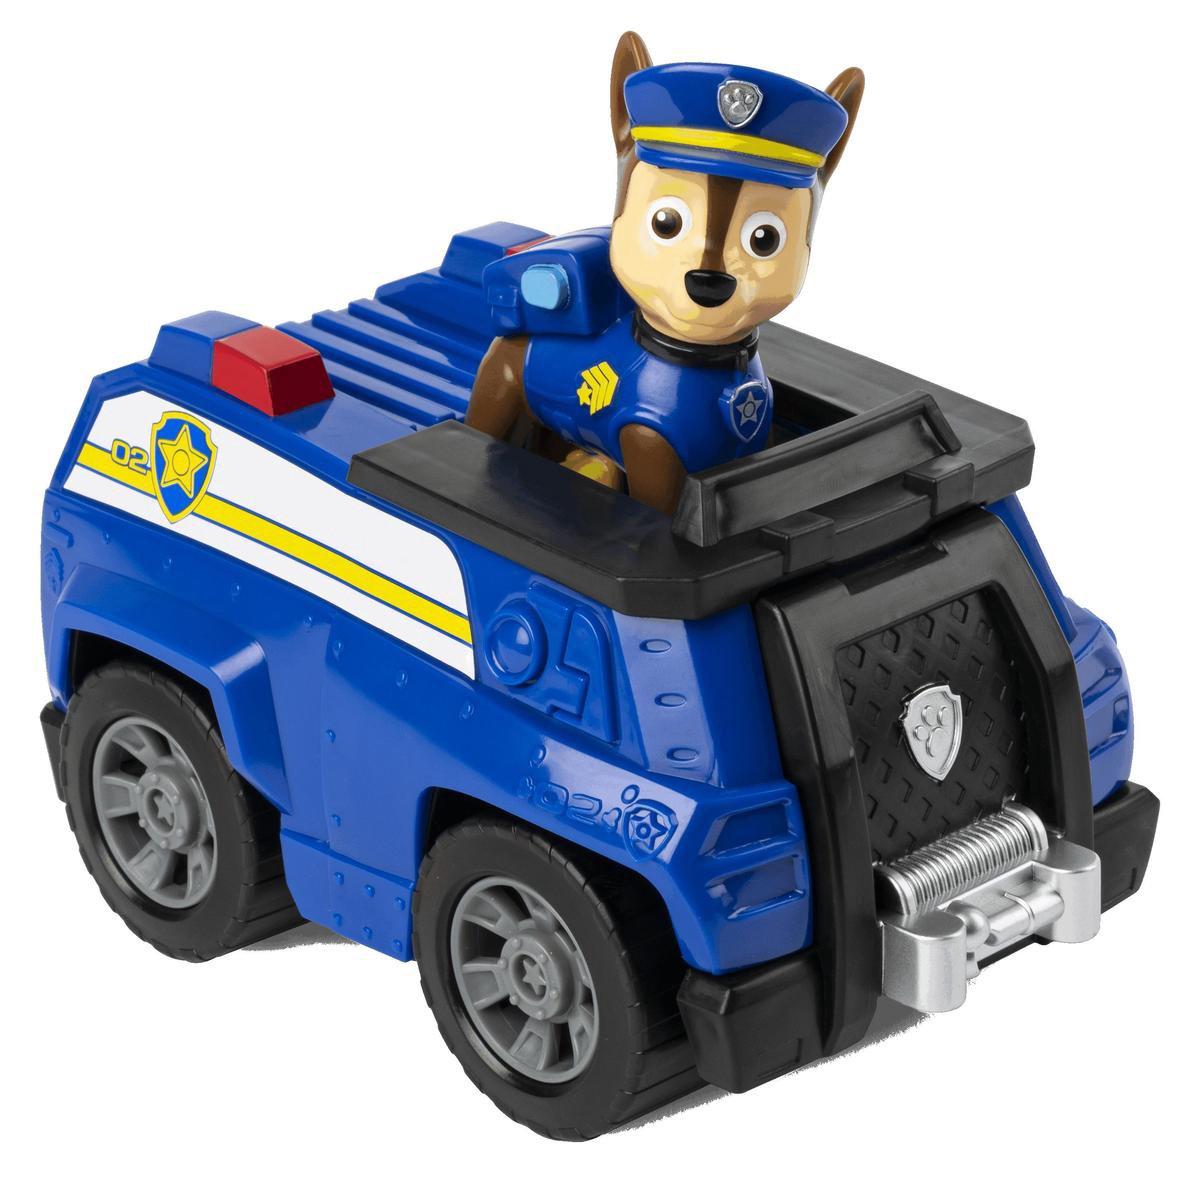 PAW Patrol Politie-auto met Chase